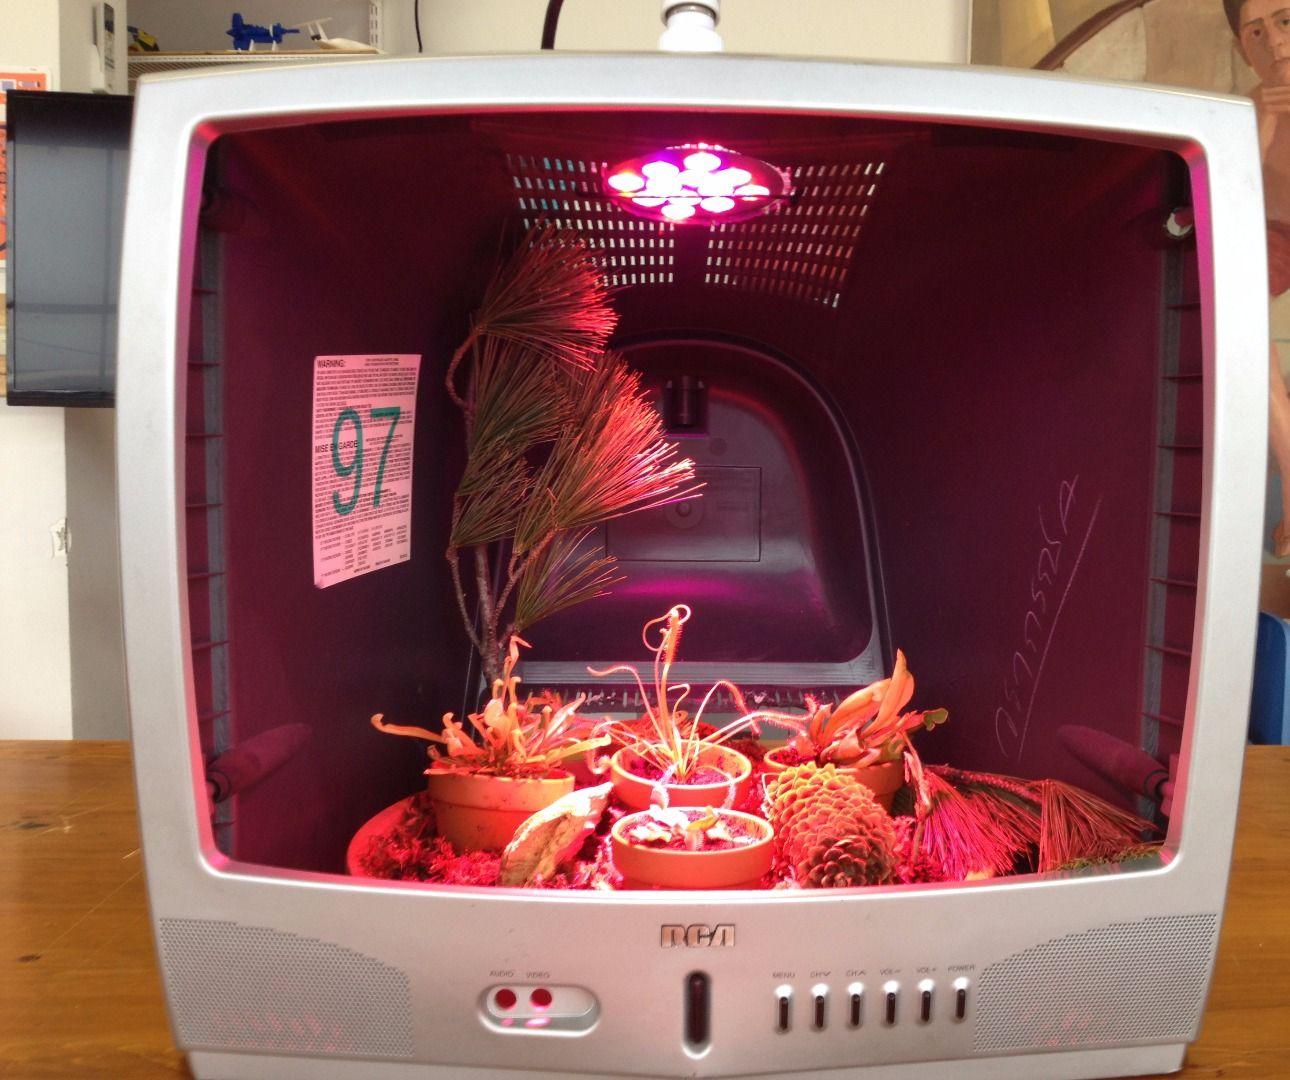 Full Spectrum Carnivorous Plant Terrarium in an Old TV